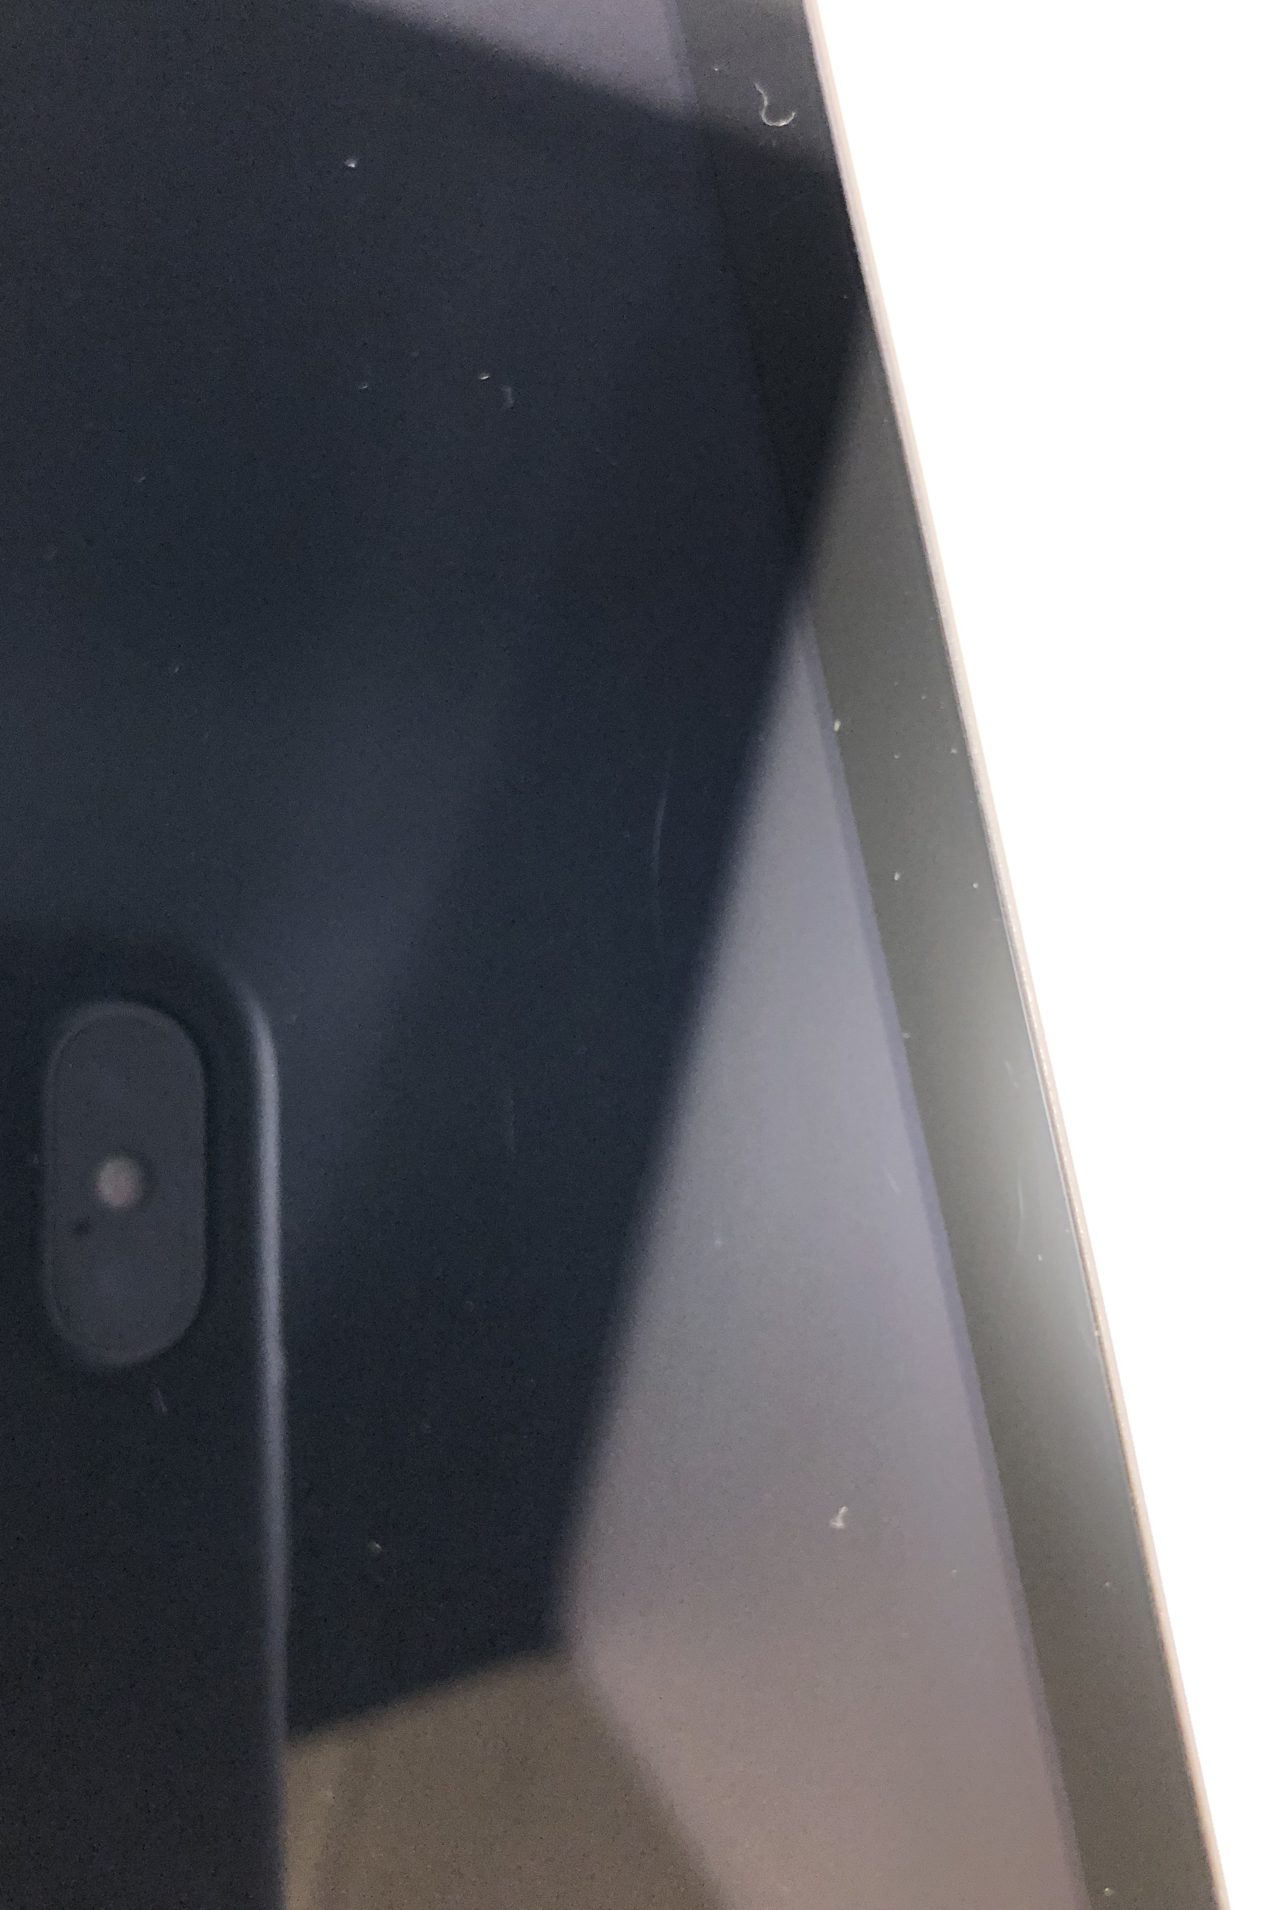 iPad mini 3 Wi-Fi + Cellular 64GB, 64GB, Space Gray, imagen 3